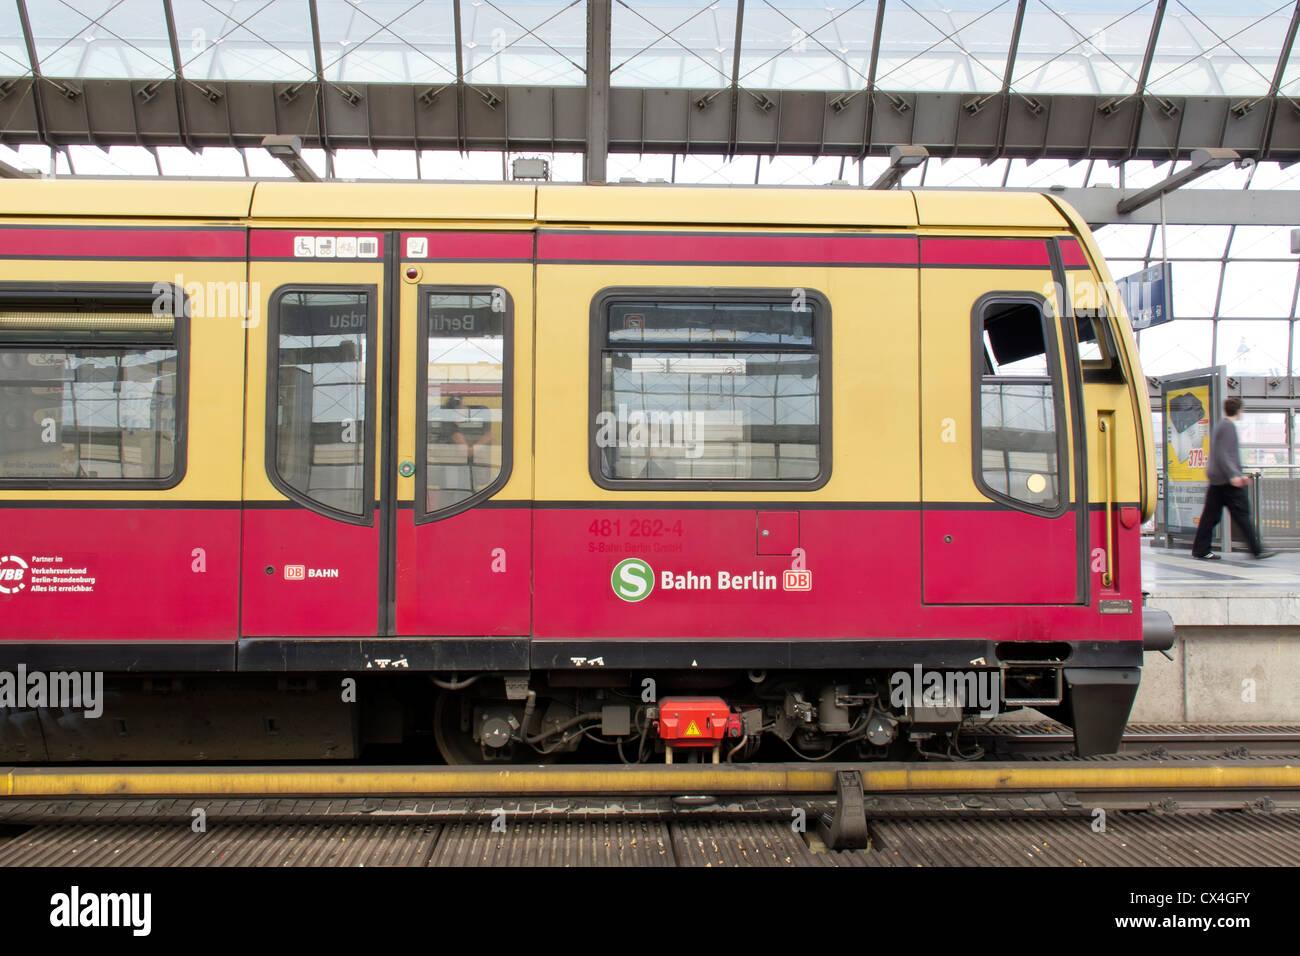 The German Railway in Berlin – Spandau an S Bahn suburban train in a German station Stock Photo